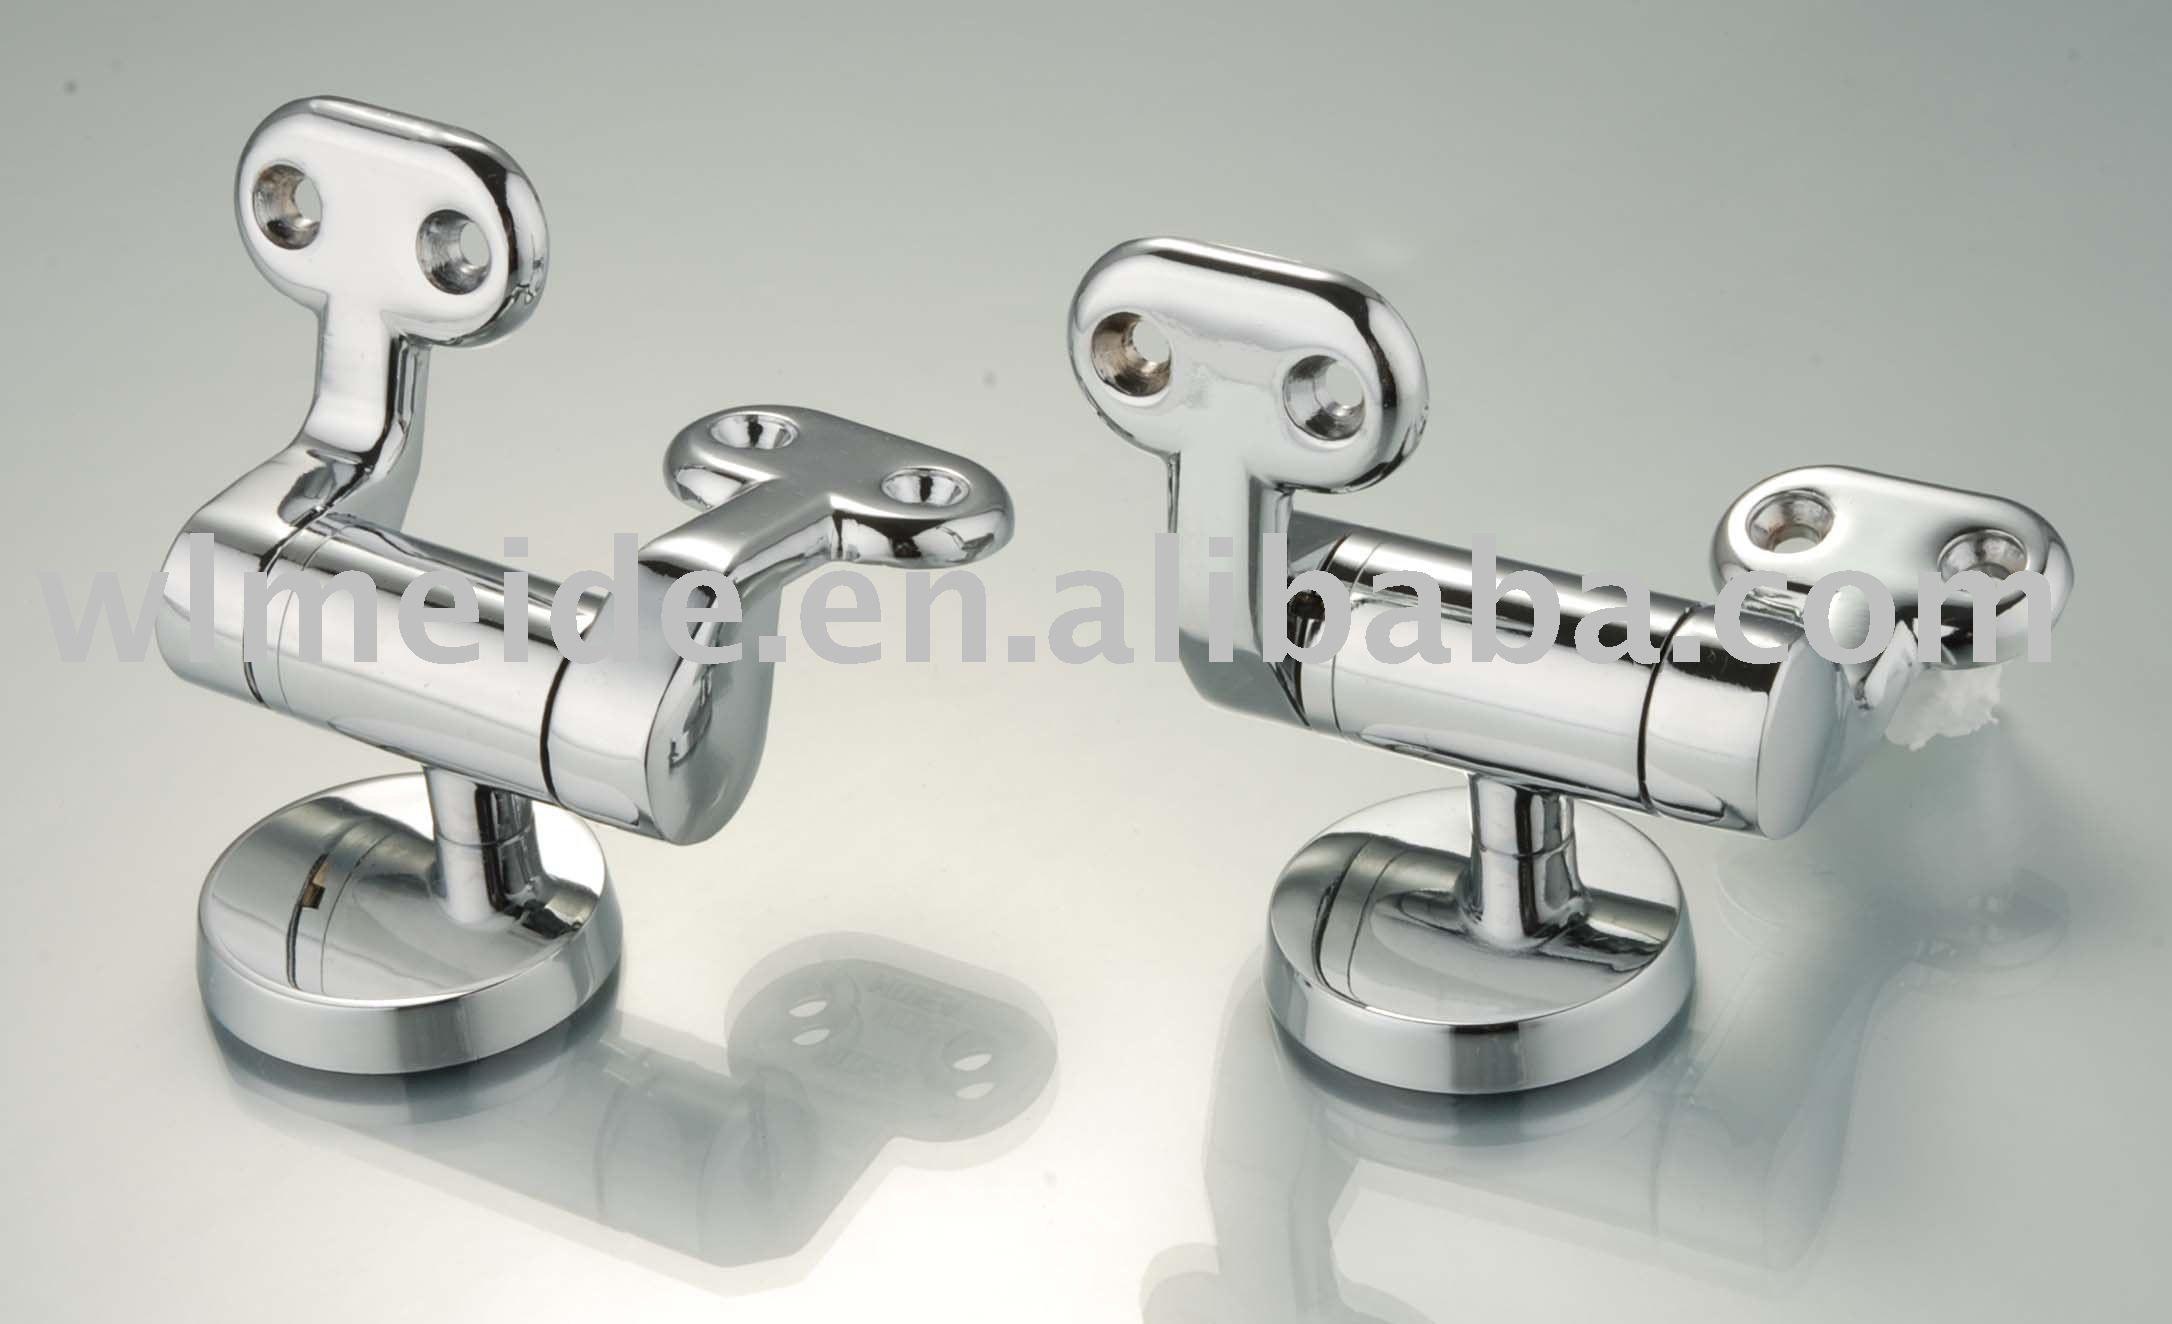 Soft Closing Toilet Seat Hinges Photo Detailed About Soft Closing Toilet Seat Hinges Picture On Alibaba Com